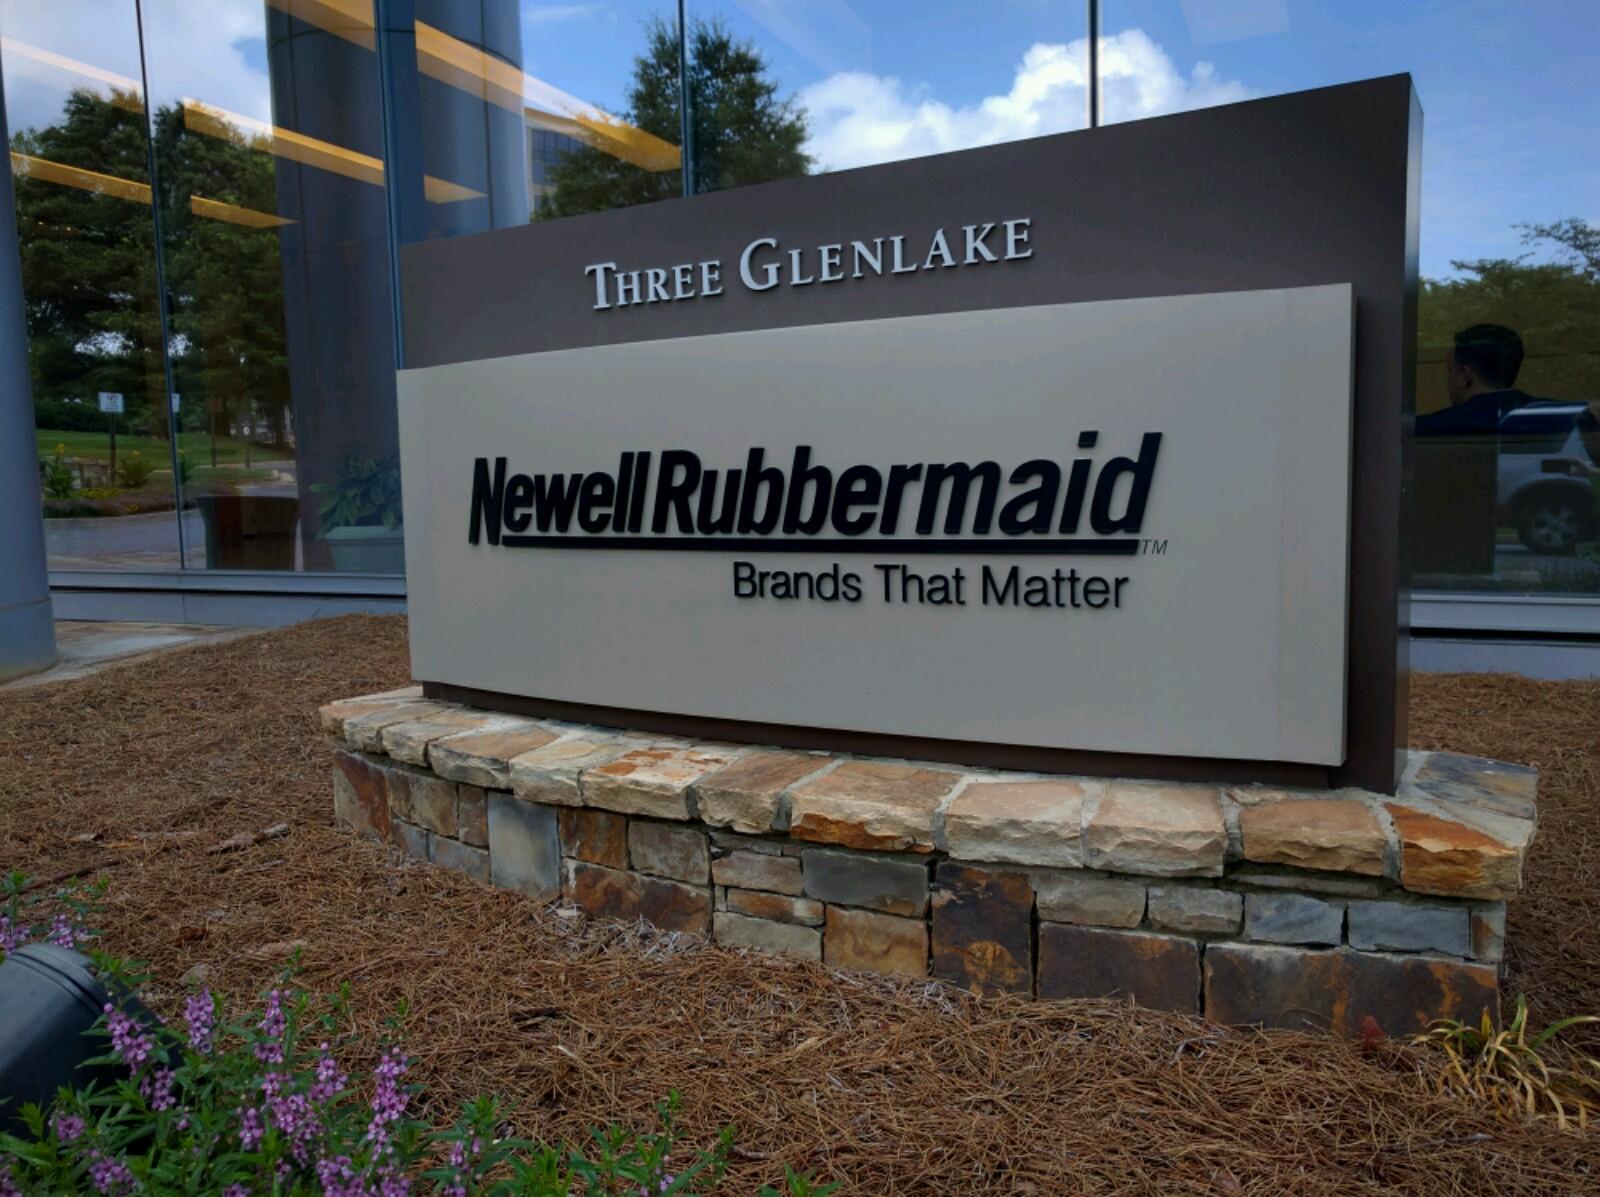 Entrance to Newell Brands' corporate headquarters in Atlanta, Georgia.